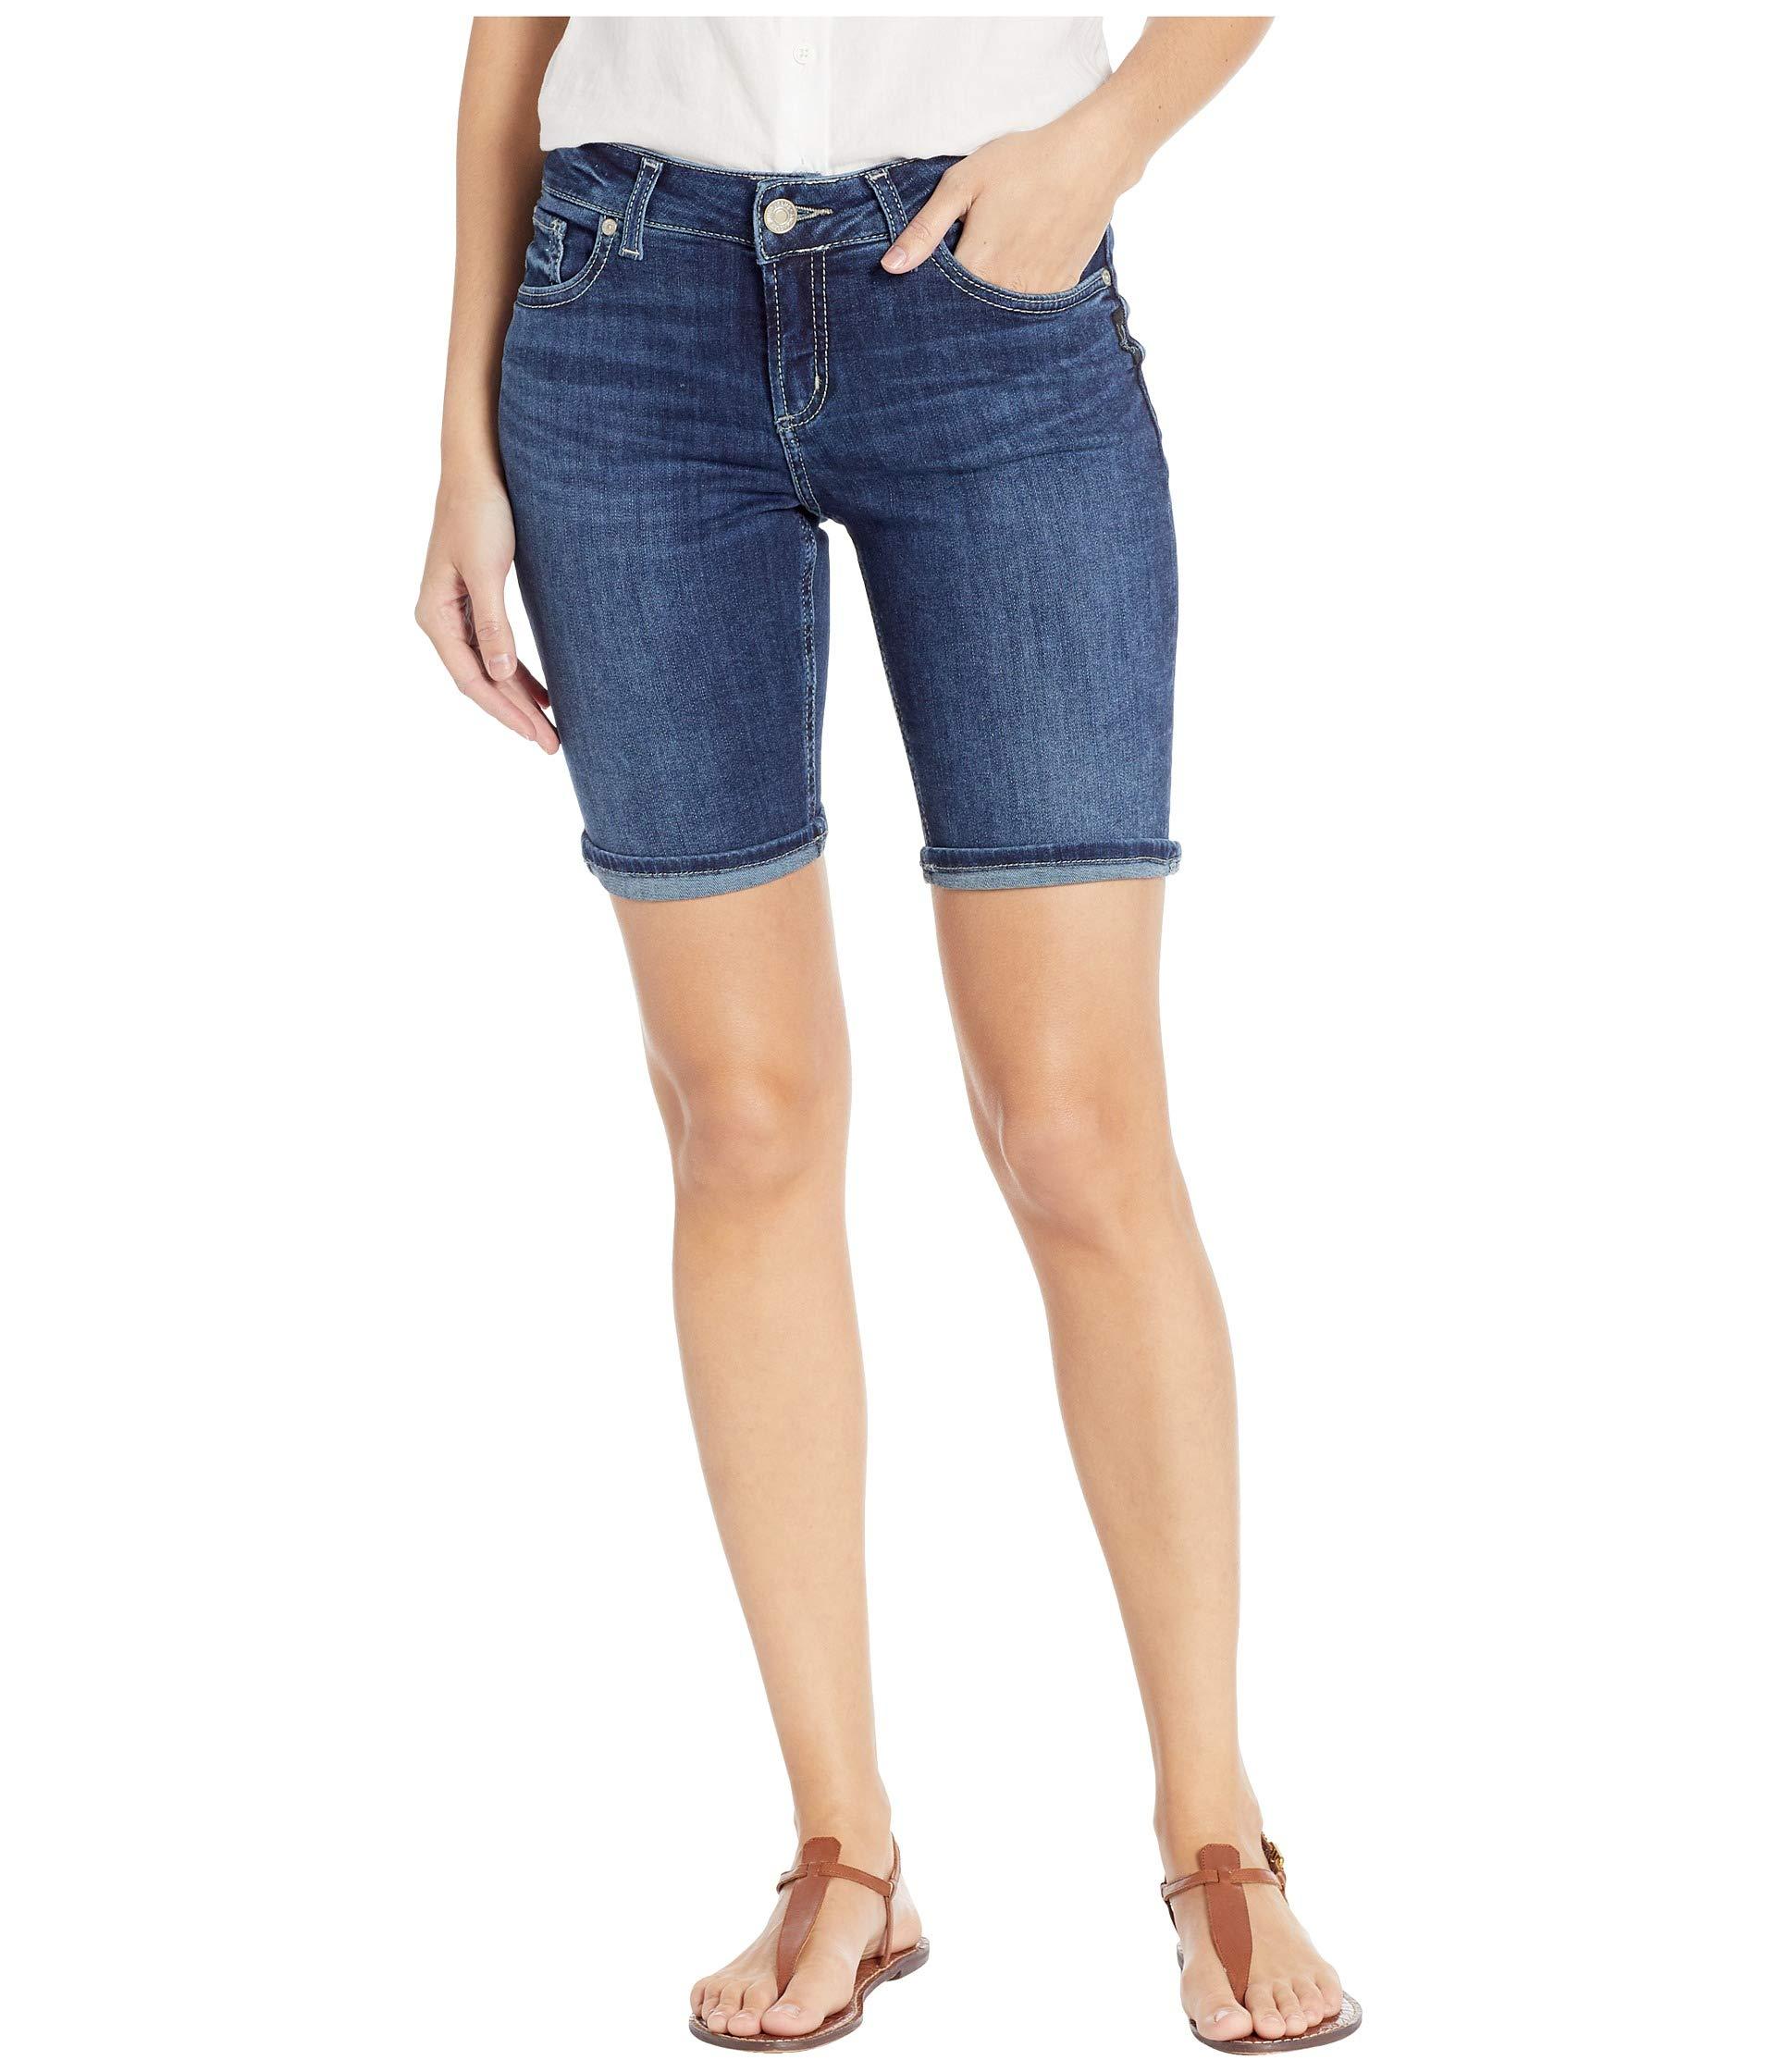 Silver Jeans Co. Women's Suki Curvy Fit Mid Rise Bermuda Shorts, Power Stretch Dark, 29W x 9L by Silver Jeans Co.